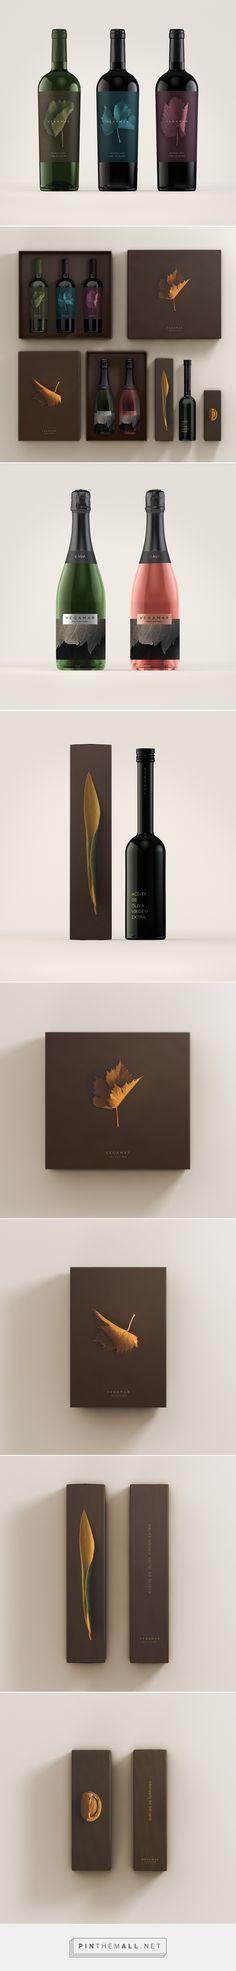 Vegamar Selección Wine Packaging by Lavernia & Cienfuegos | Fivestar Branding Agency – Design and Branding Agency & Curated Inspiration Gallery